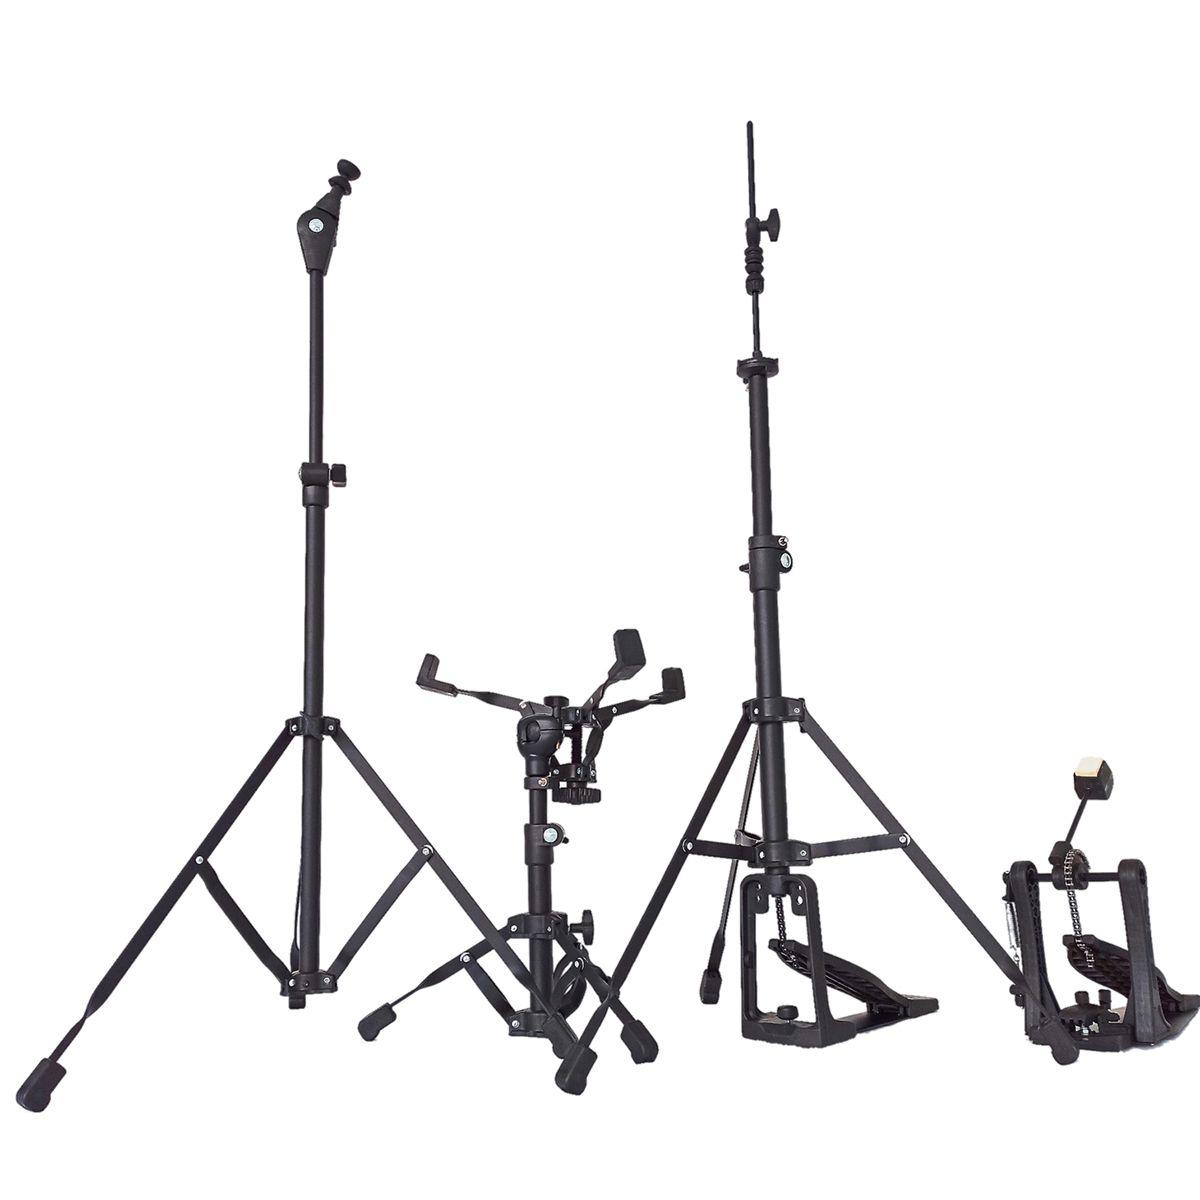 Bateria Acústica RMV Crossroad Scorpion ASPIRE 2 toms 20,10,12,14 cx 14 c/Pratos PBSA20035 Prata